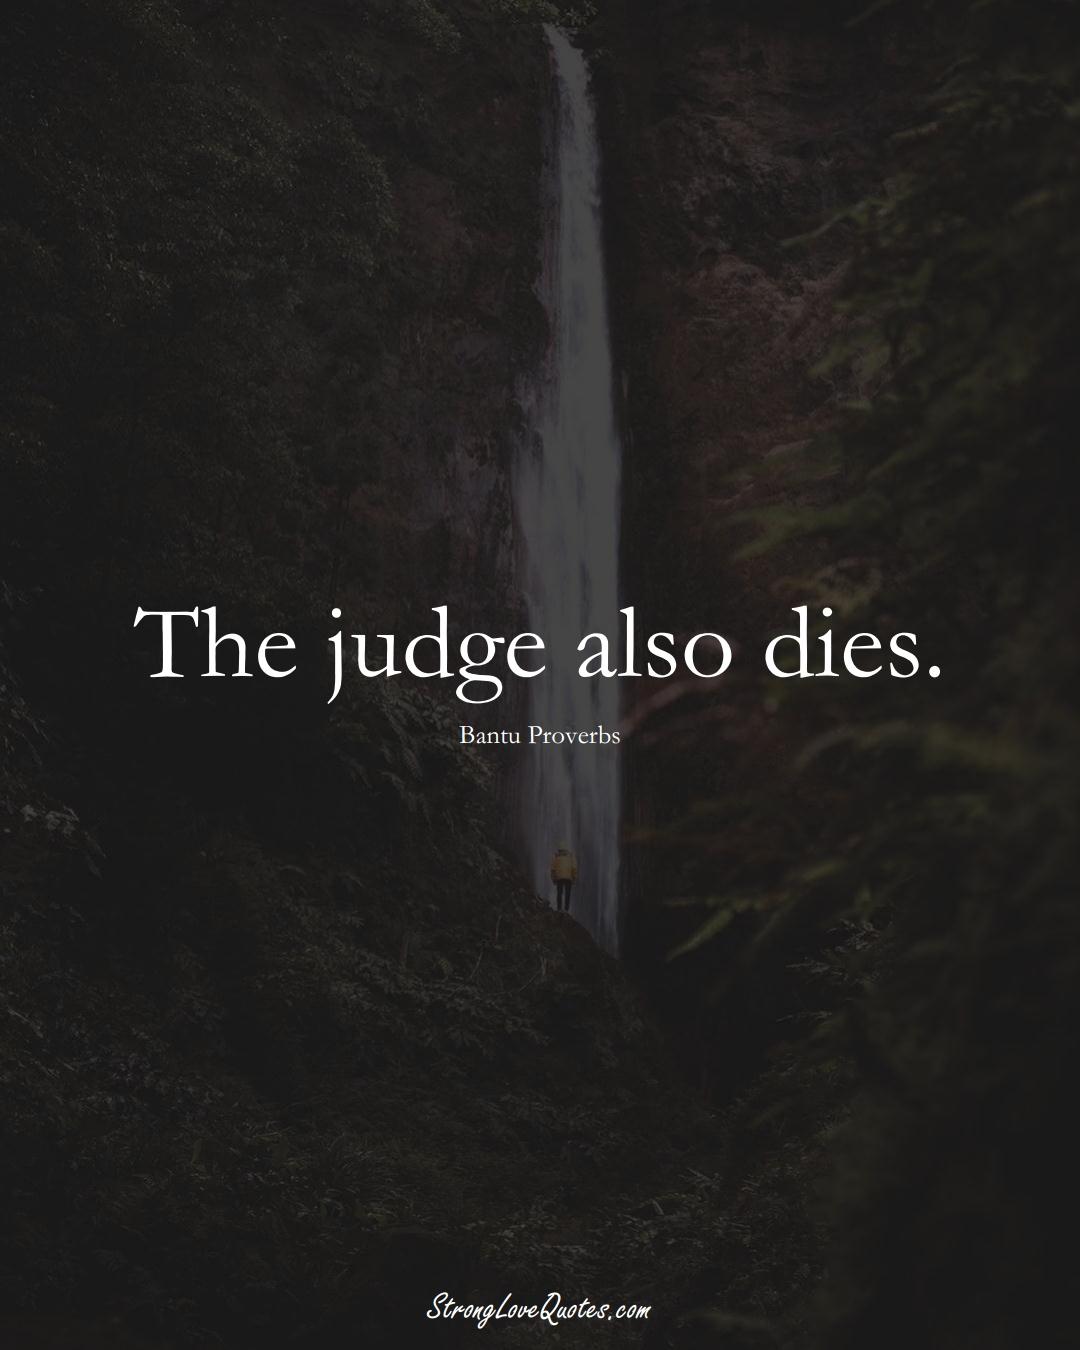 The judge also dies. (Bantu Sayings);  #aVarietyofCulturesSayings